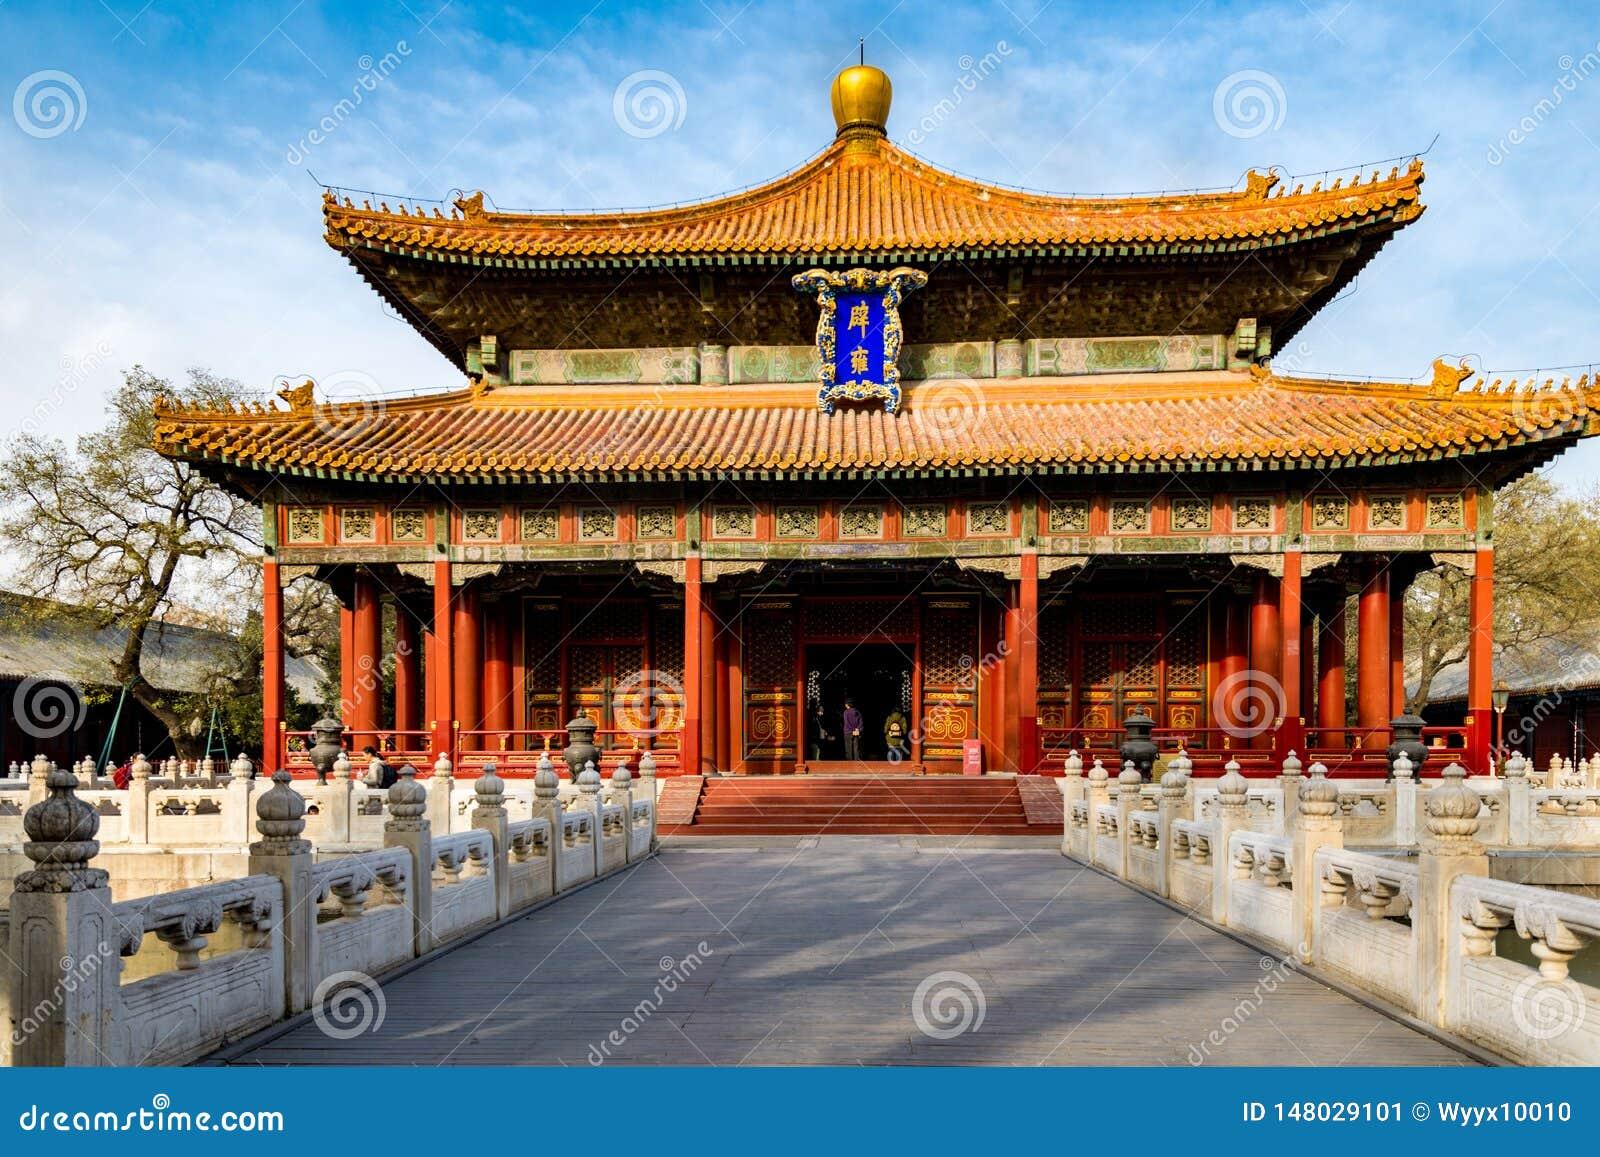 Klasyczna i Historyczna architektura w Pekin, Chiny